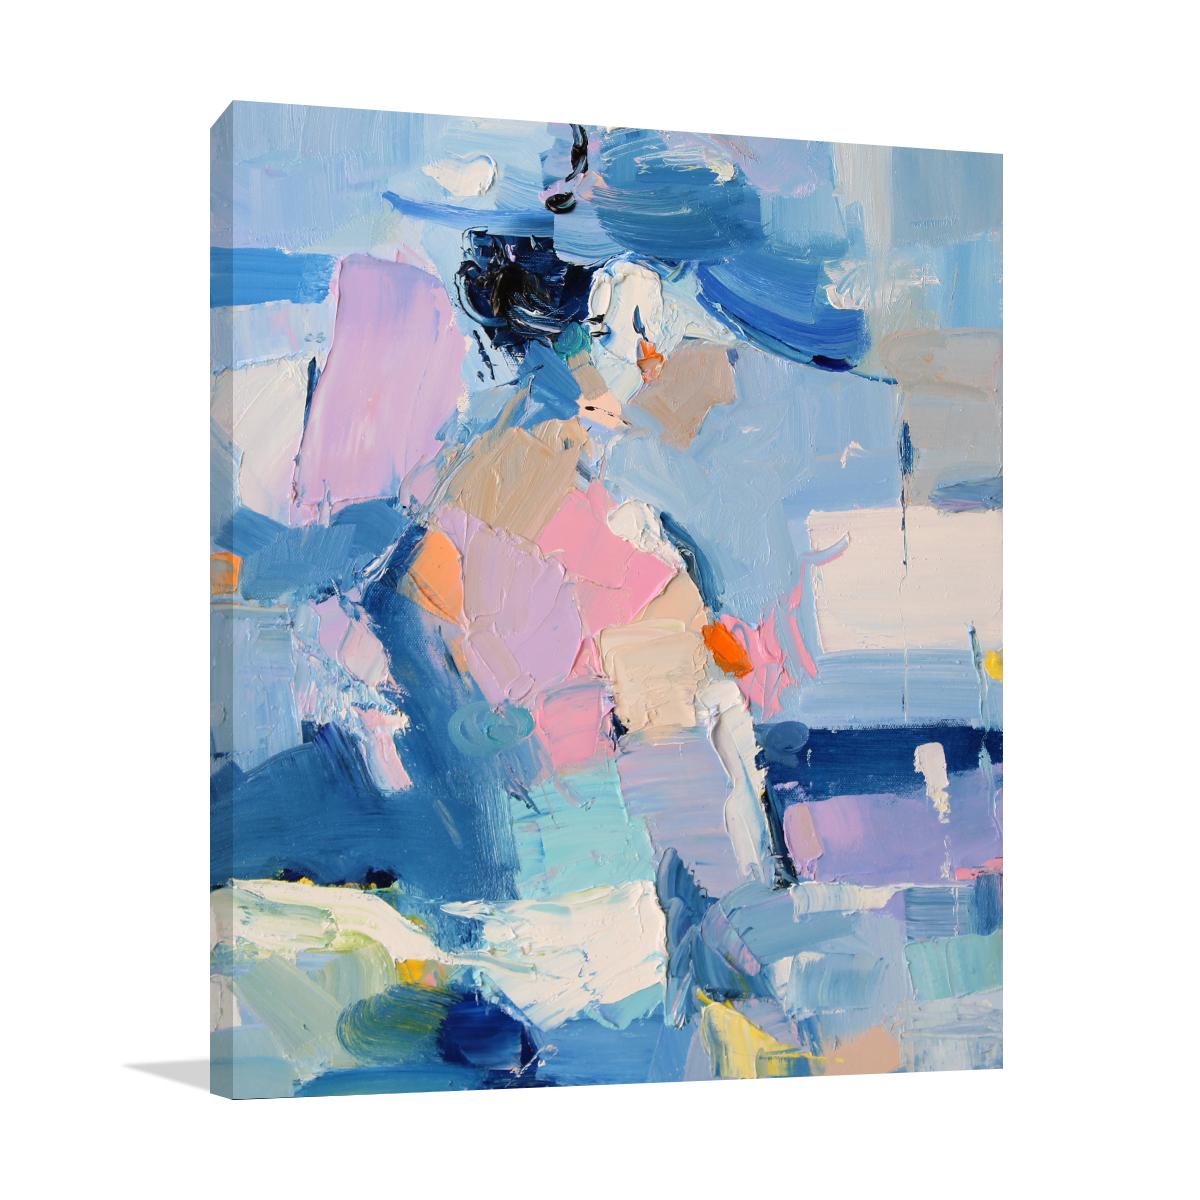 Oil on Canvas | Li Zhou Paintings